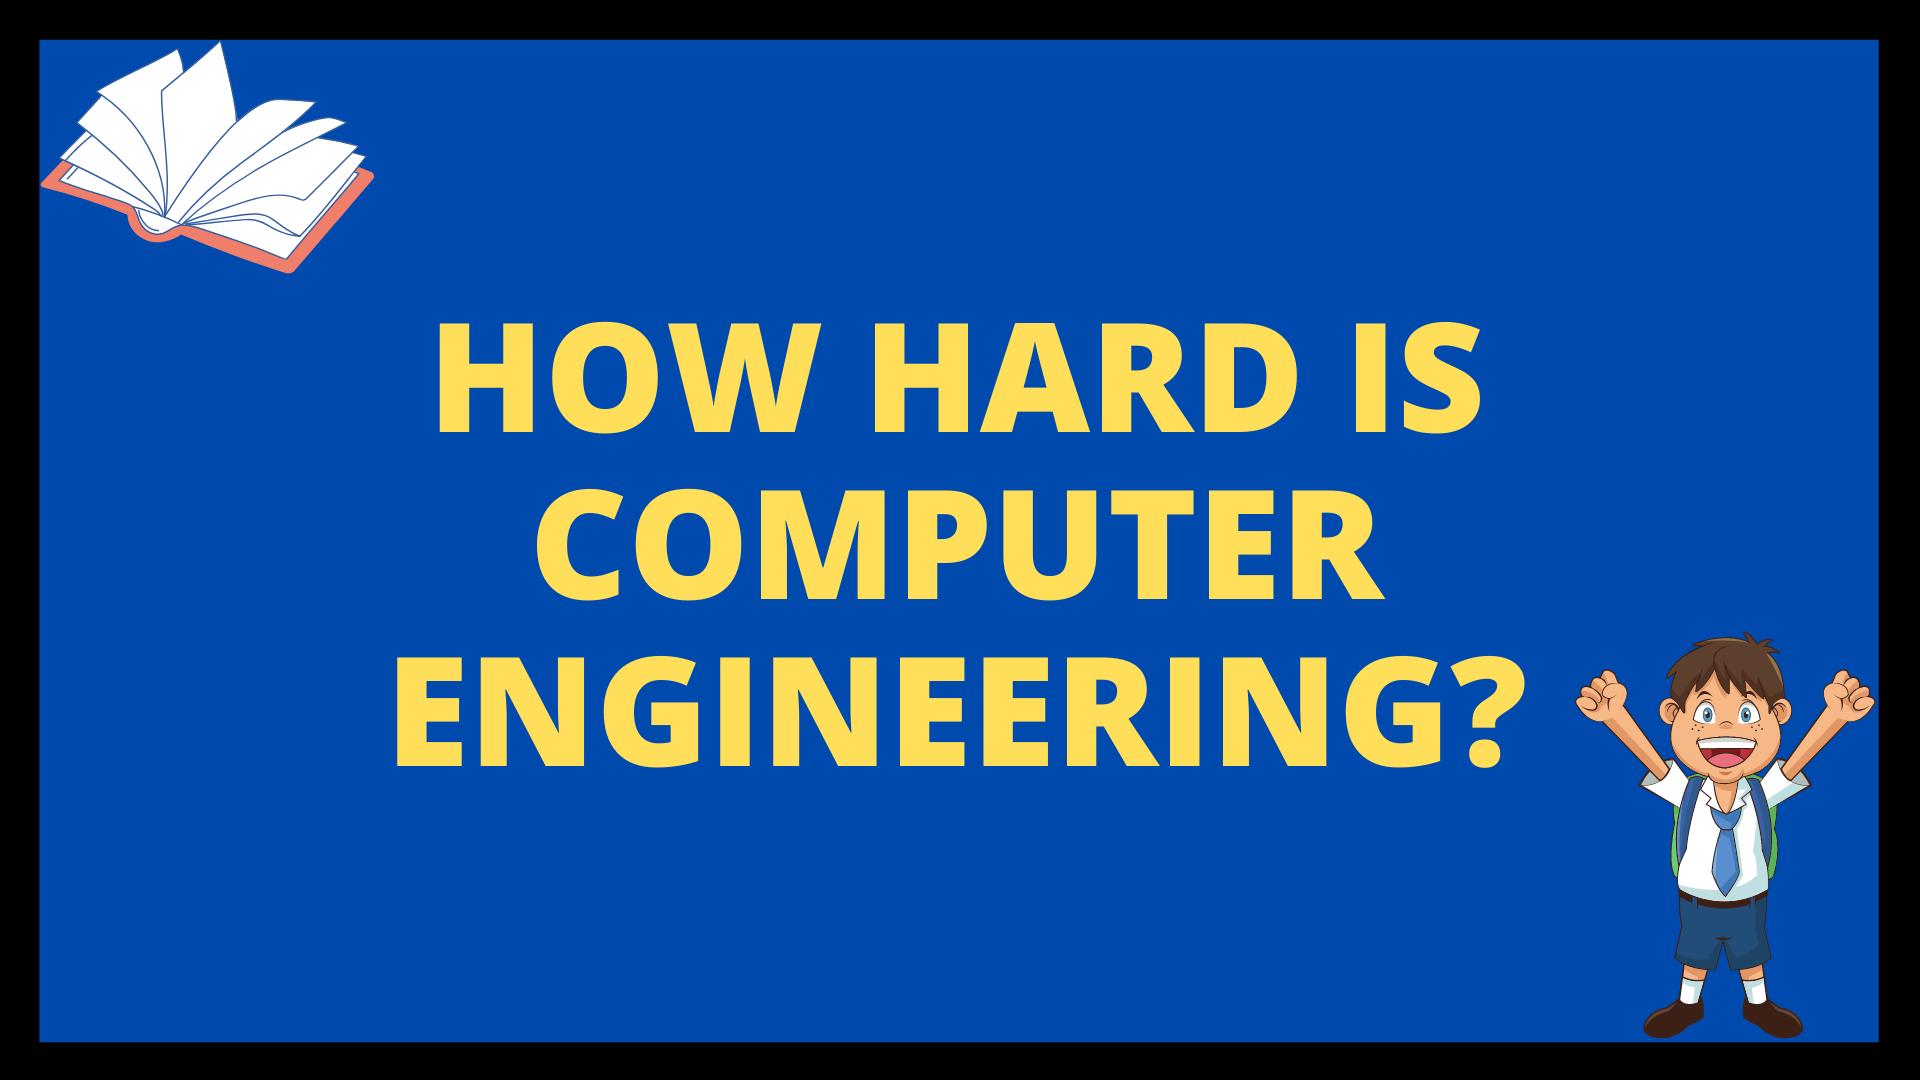 How Hard is Computer Engineering?